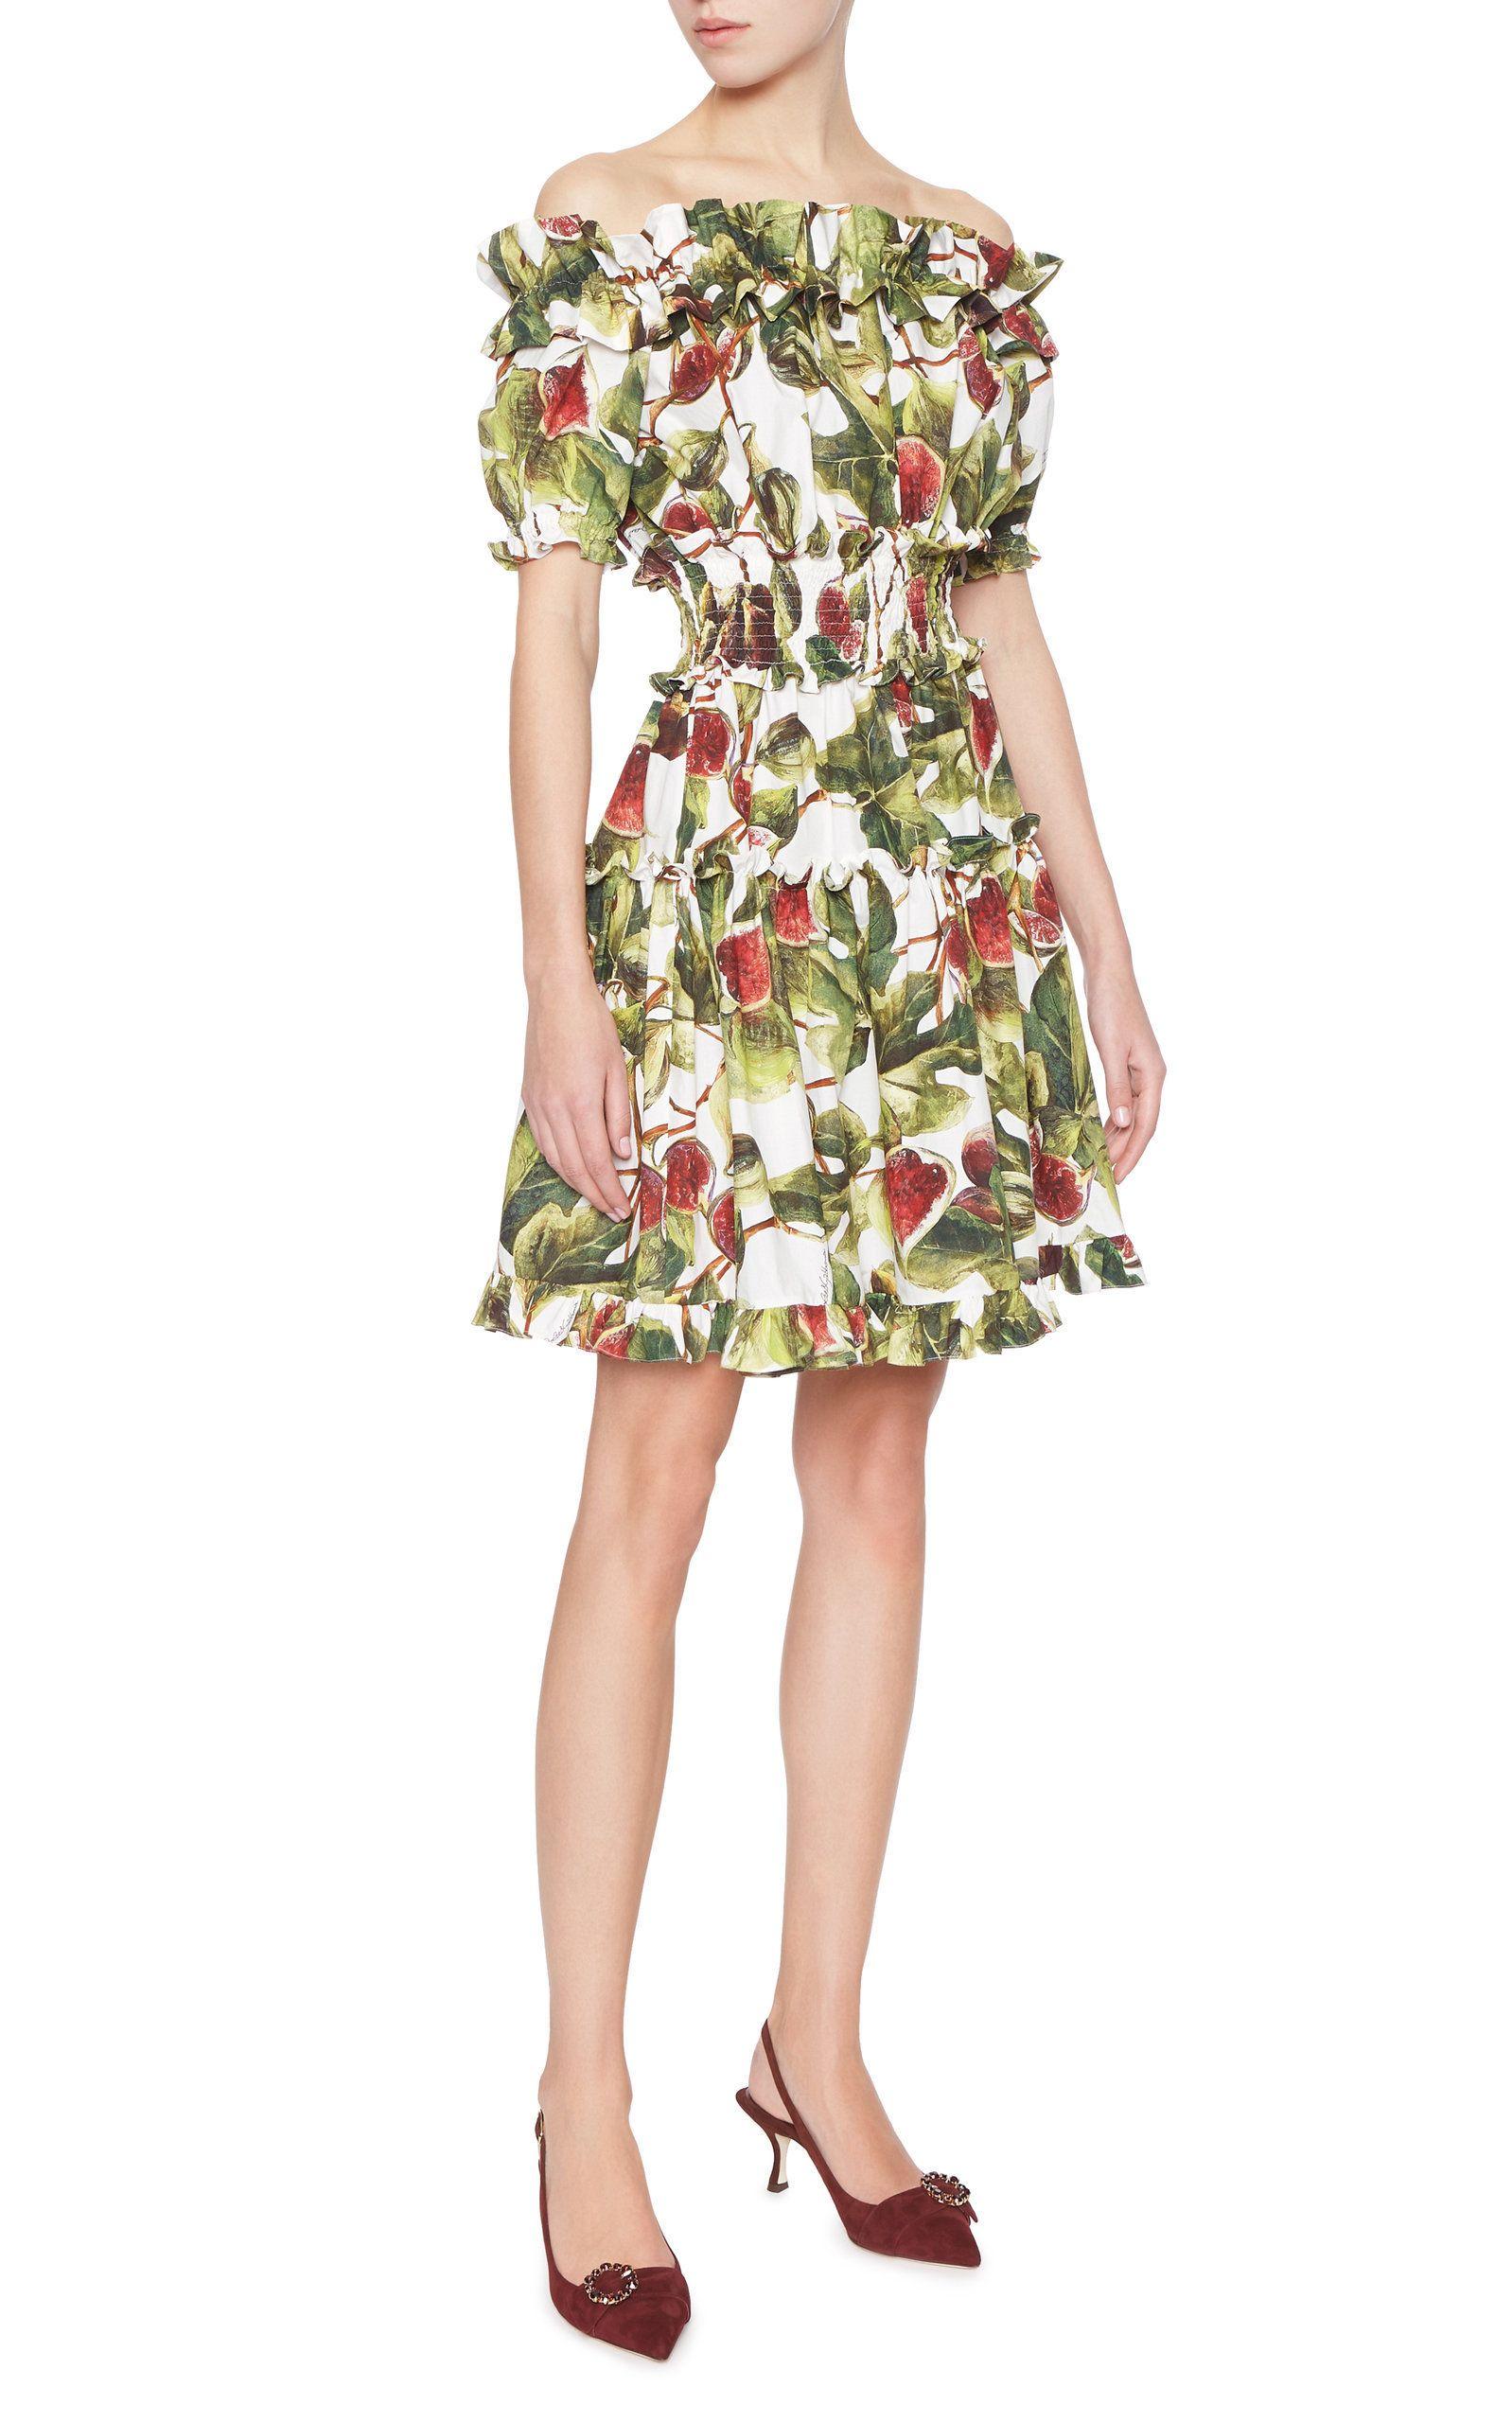 Off-The-Shoulder Printed Cotton-Poplin MIni Dress Dolce & Gabbana H2mf4v